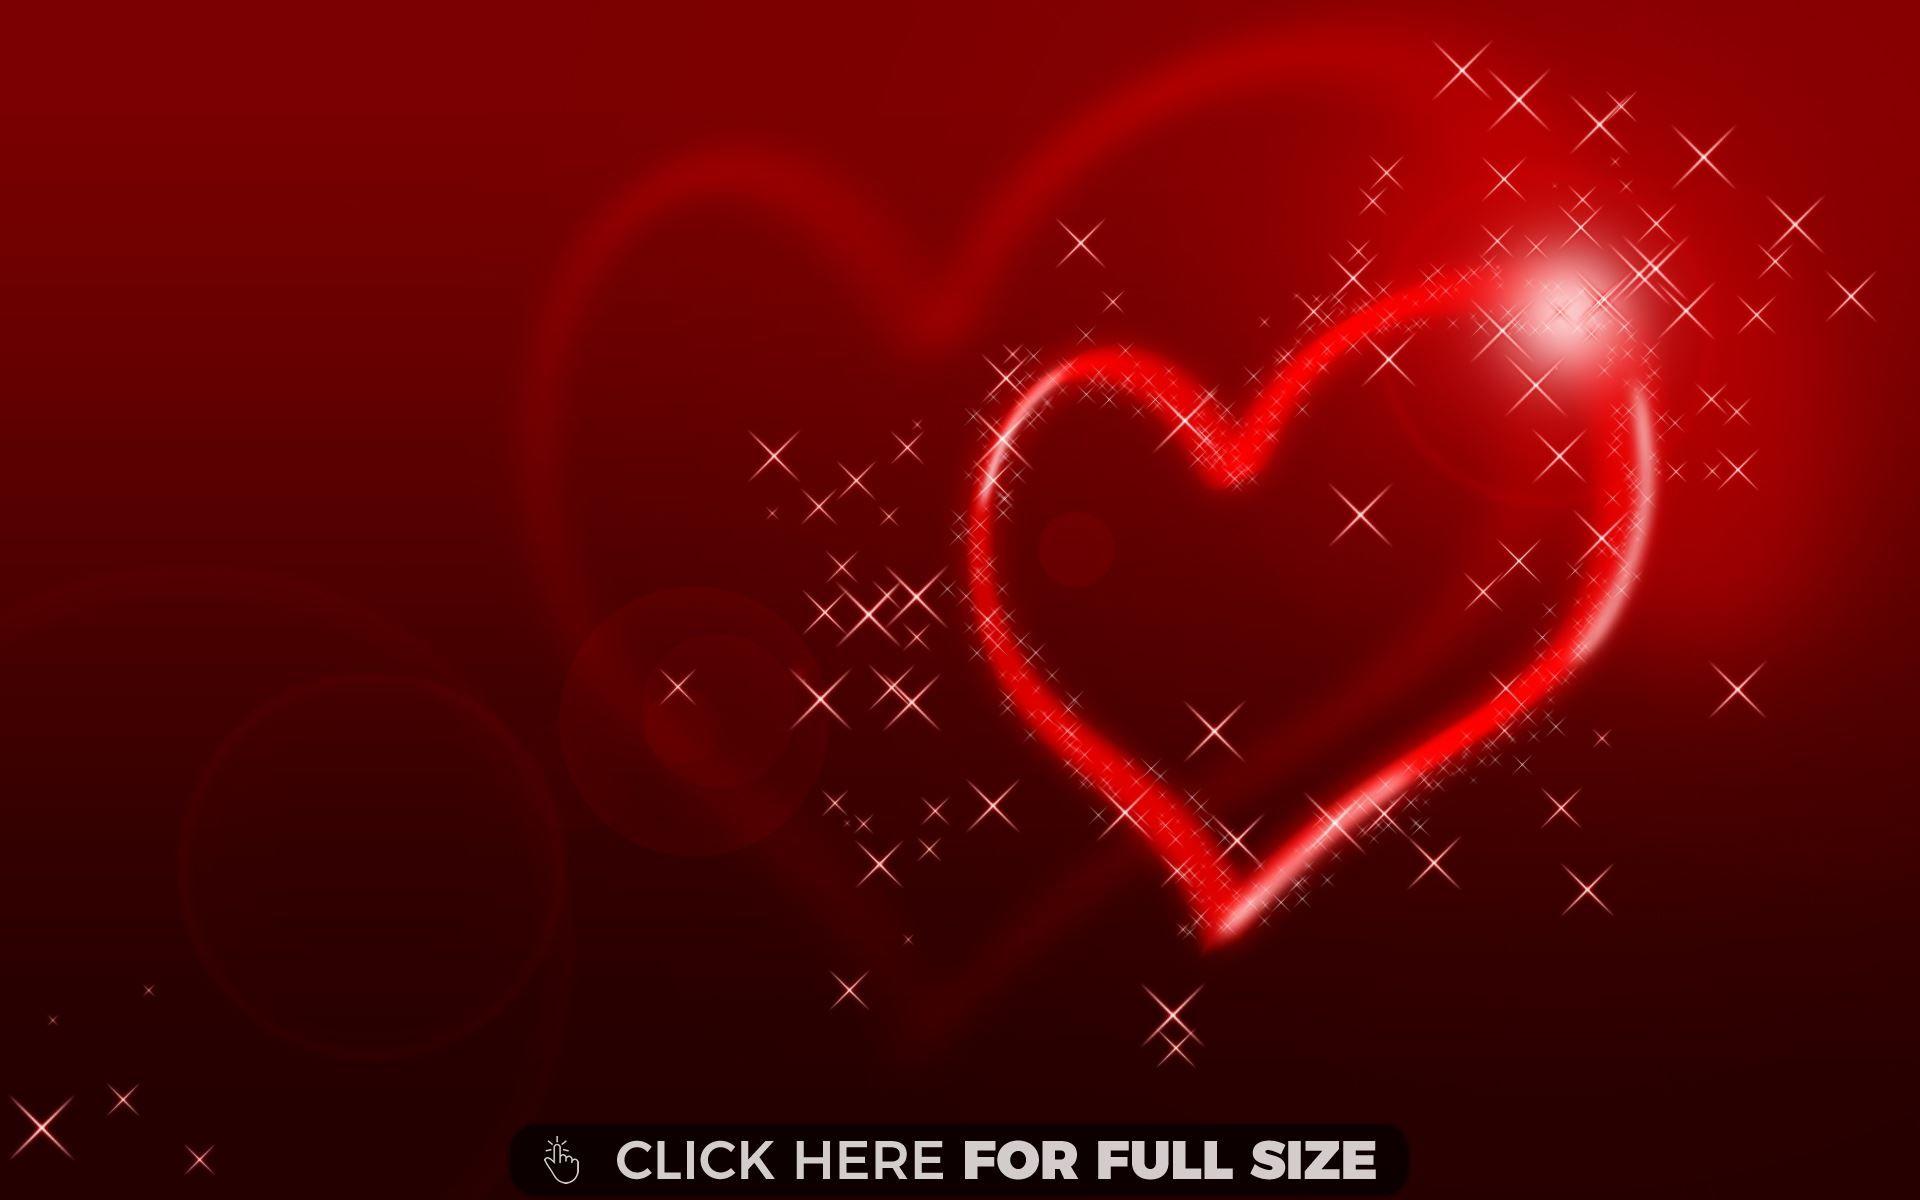 Glittering Heart Heart Wallpaper Heart Wallpaper Hd Photo Heart